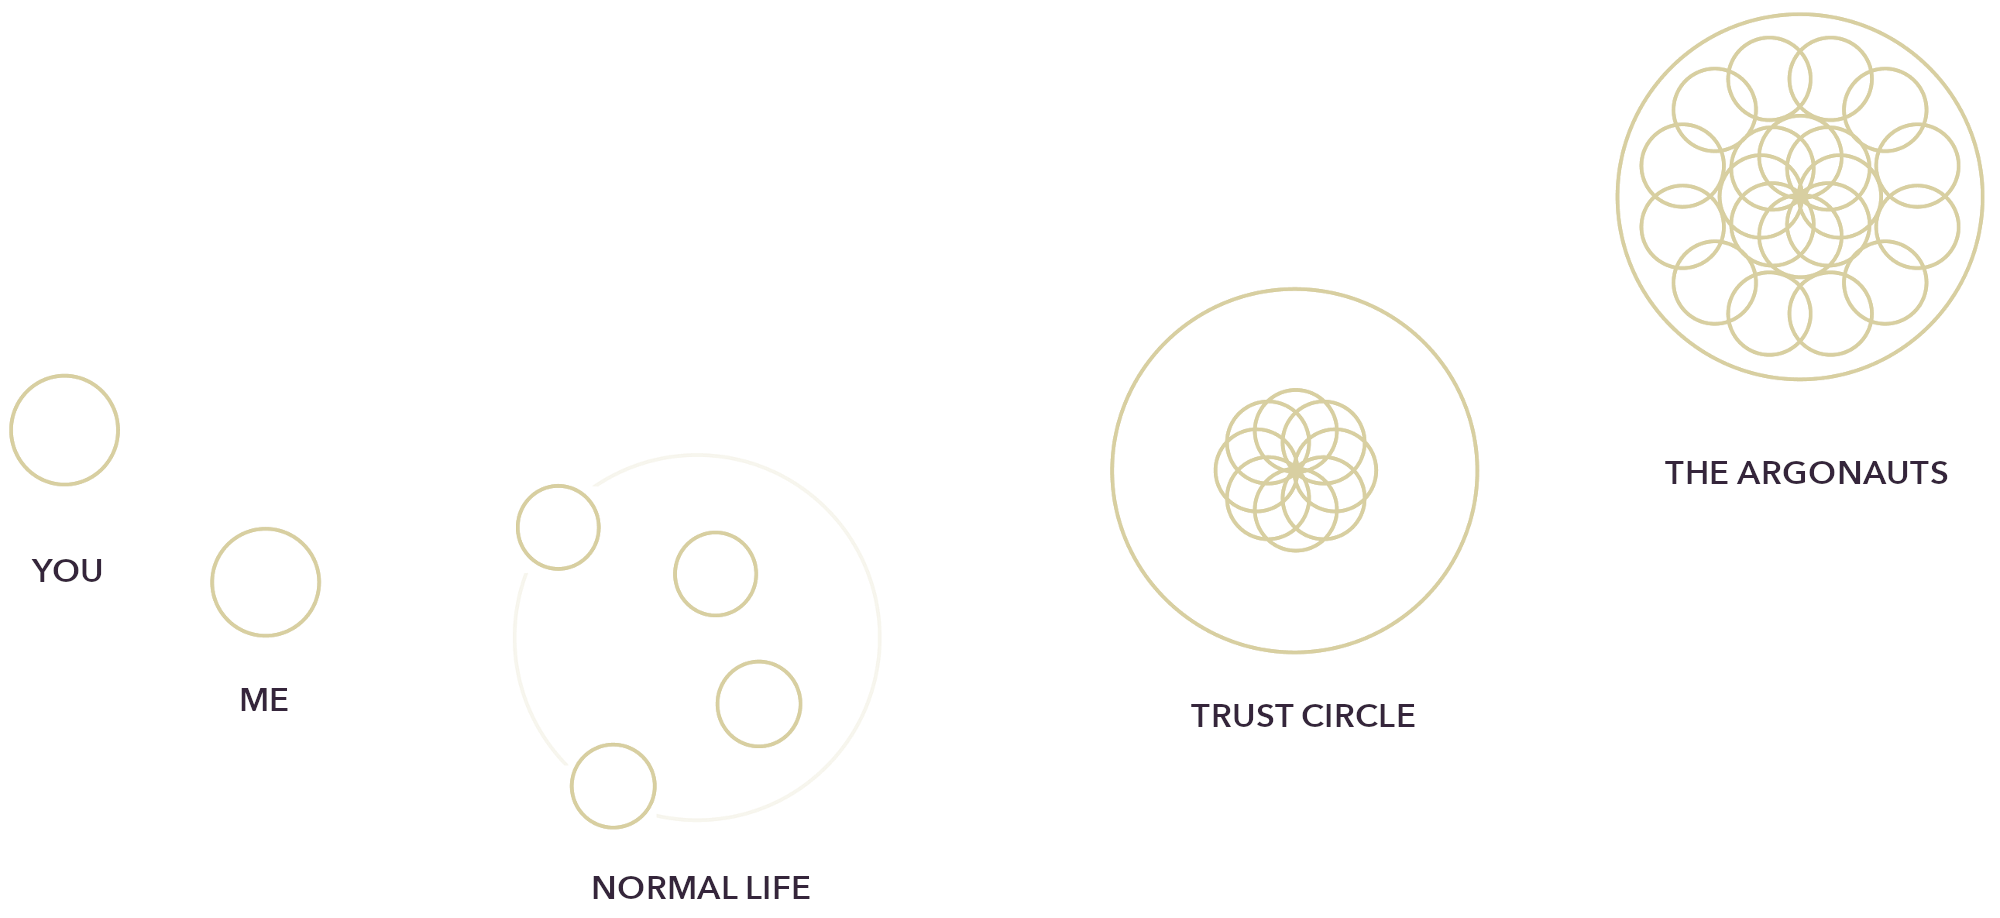 The Argonauts Community and Trust Circles